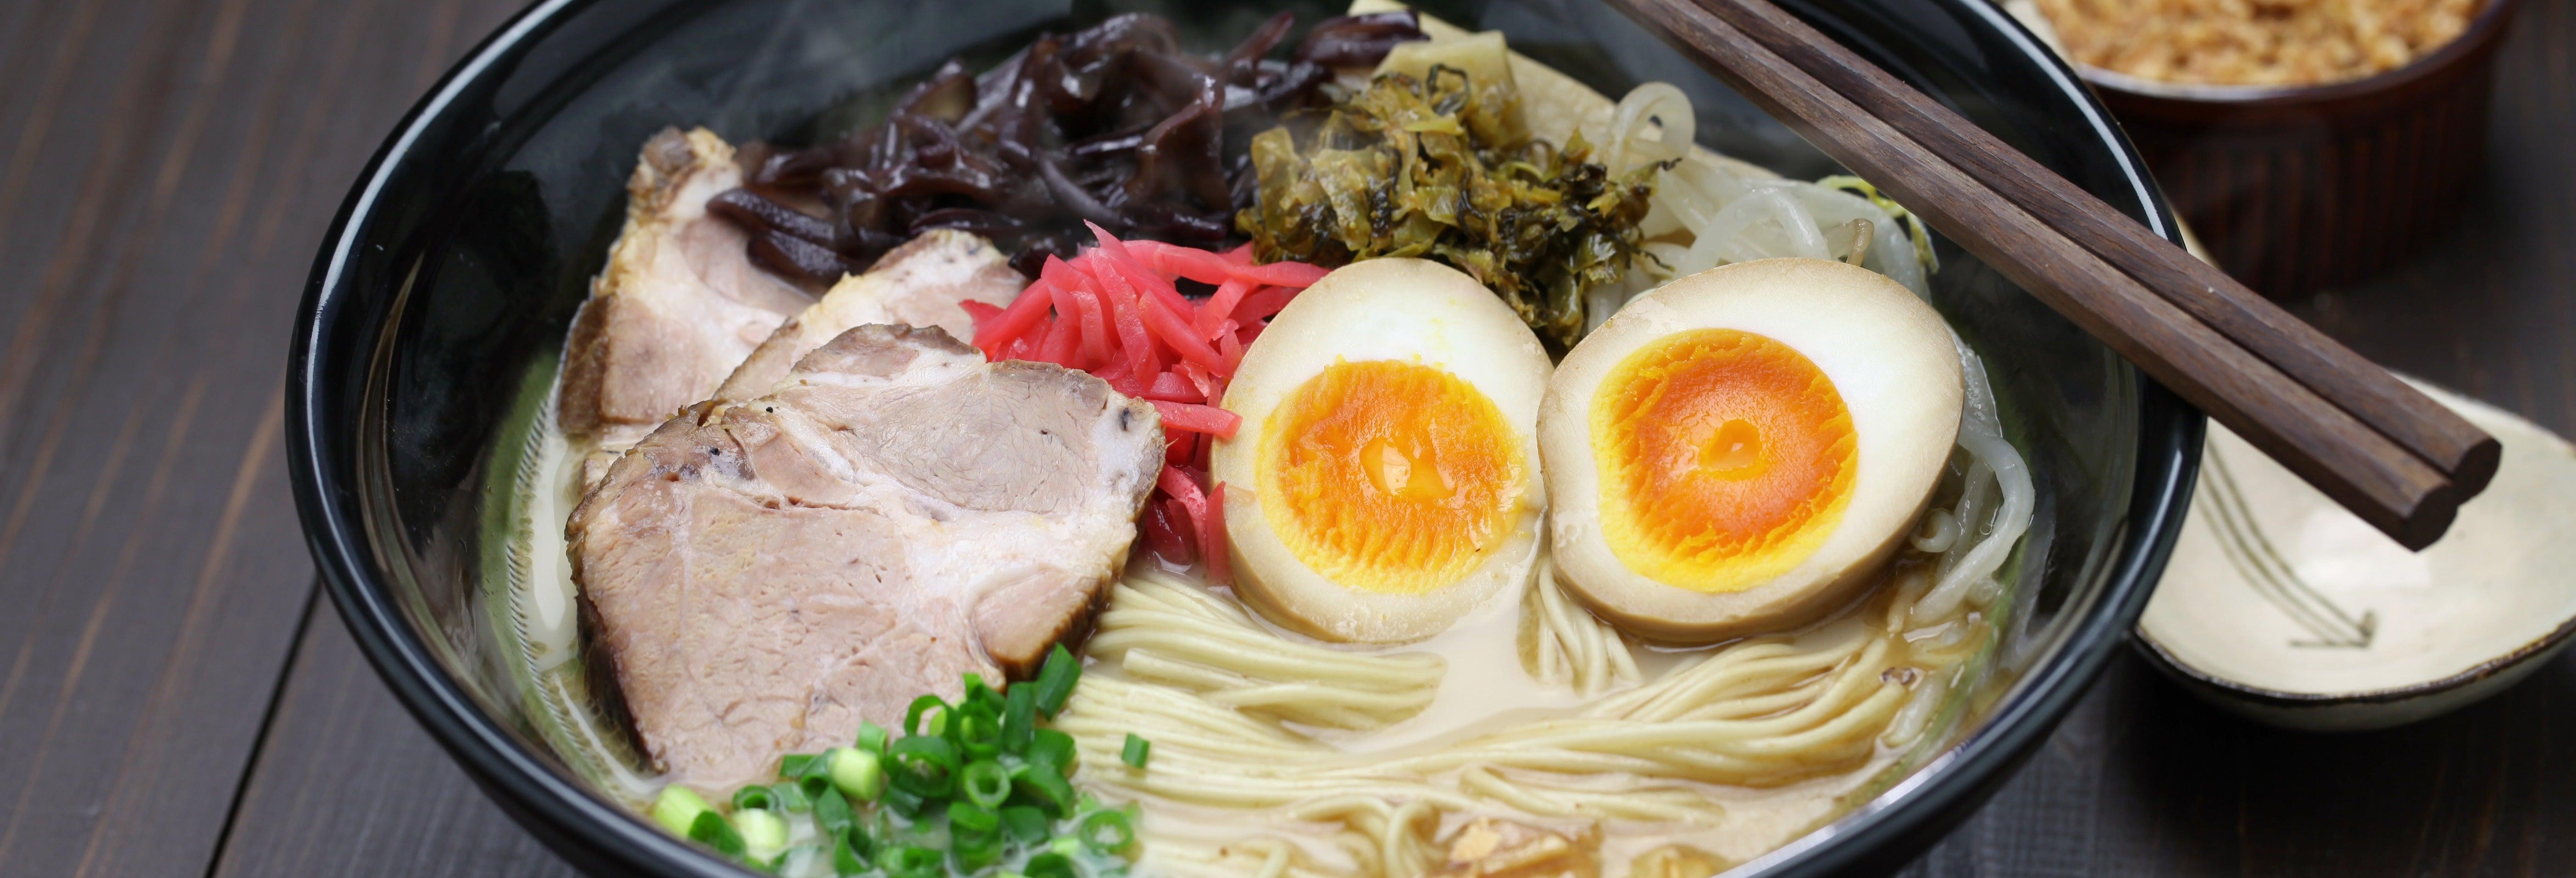 Tour gastronómico por Shinjuku